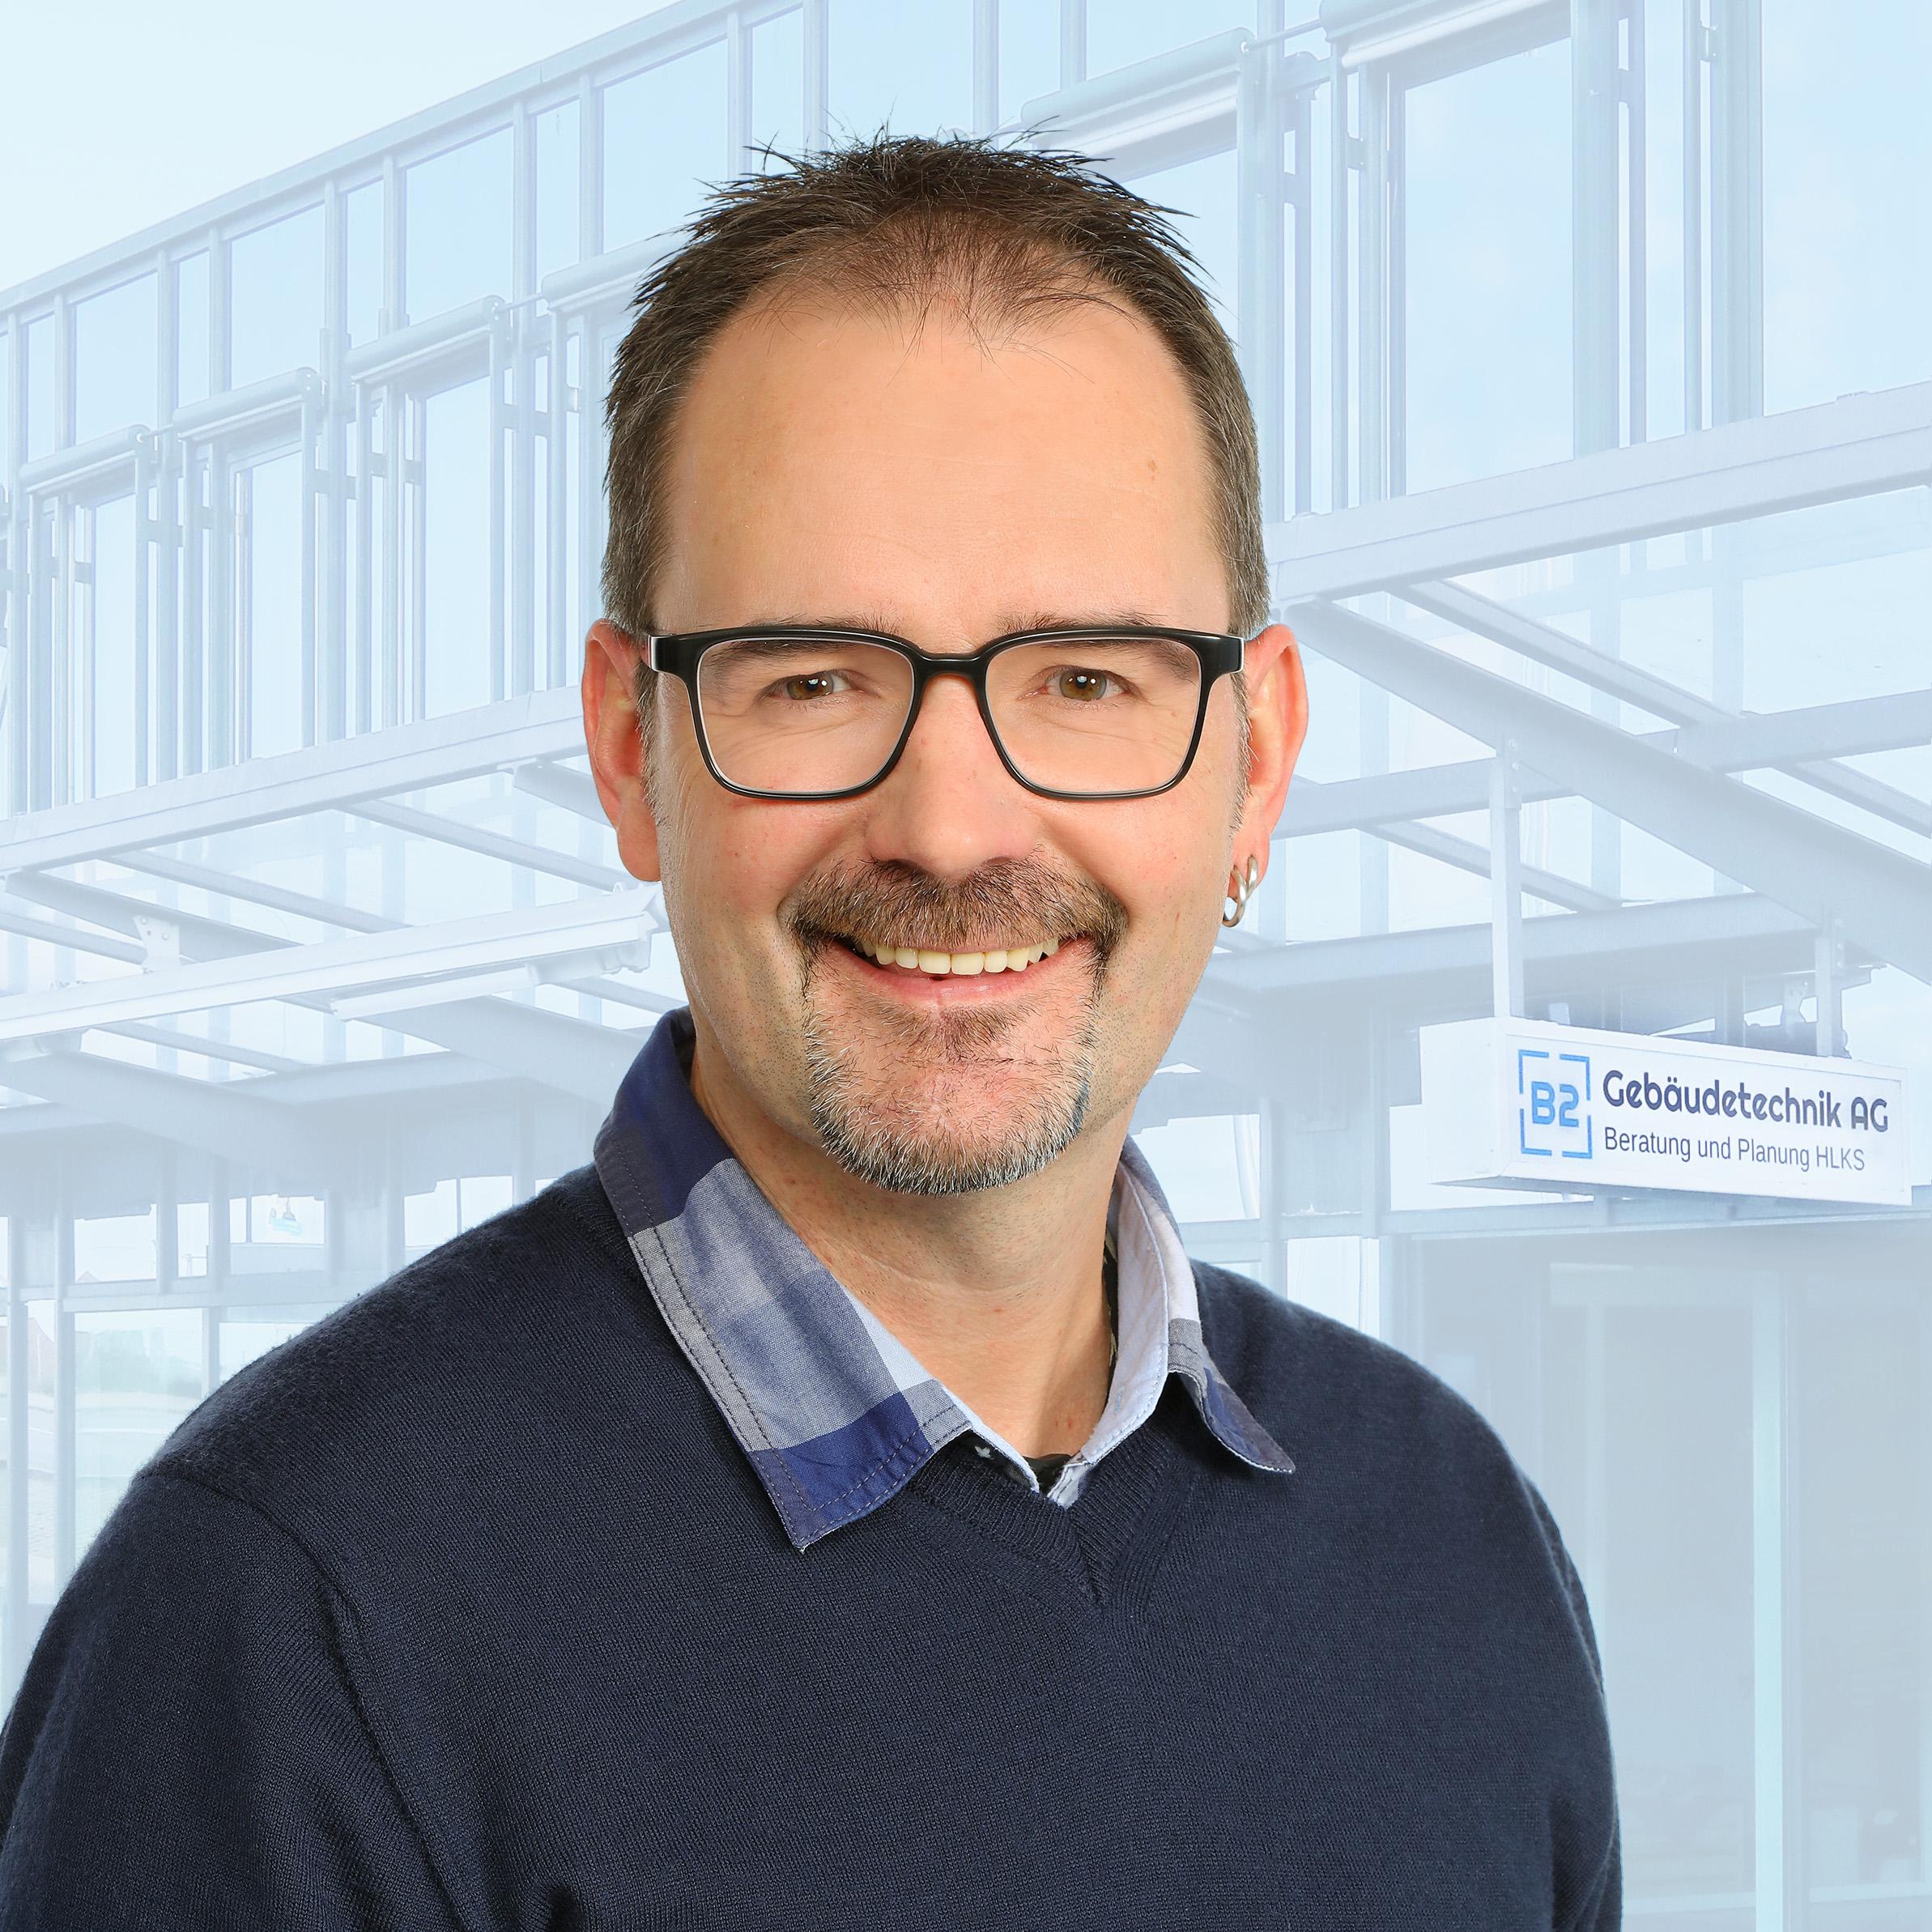 Martin Belk